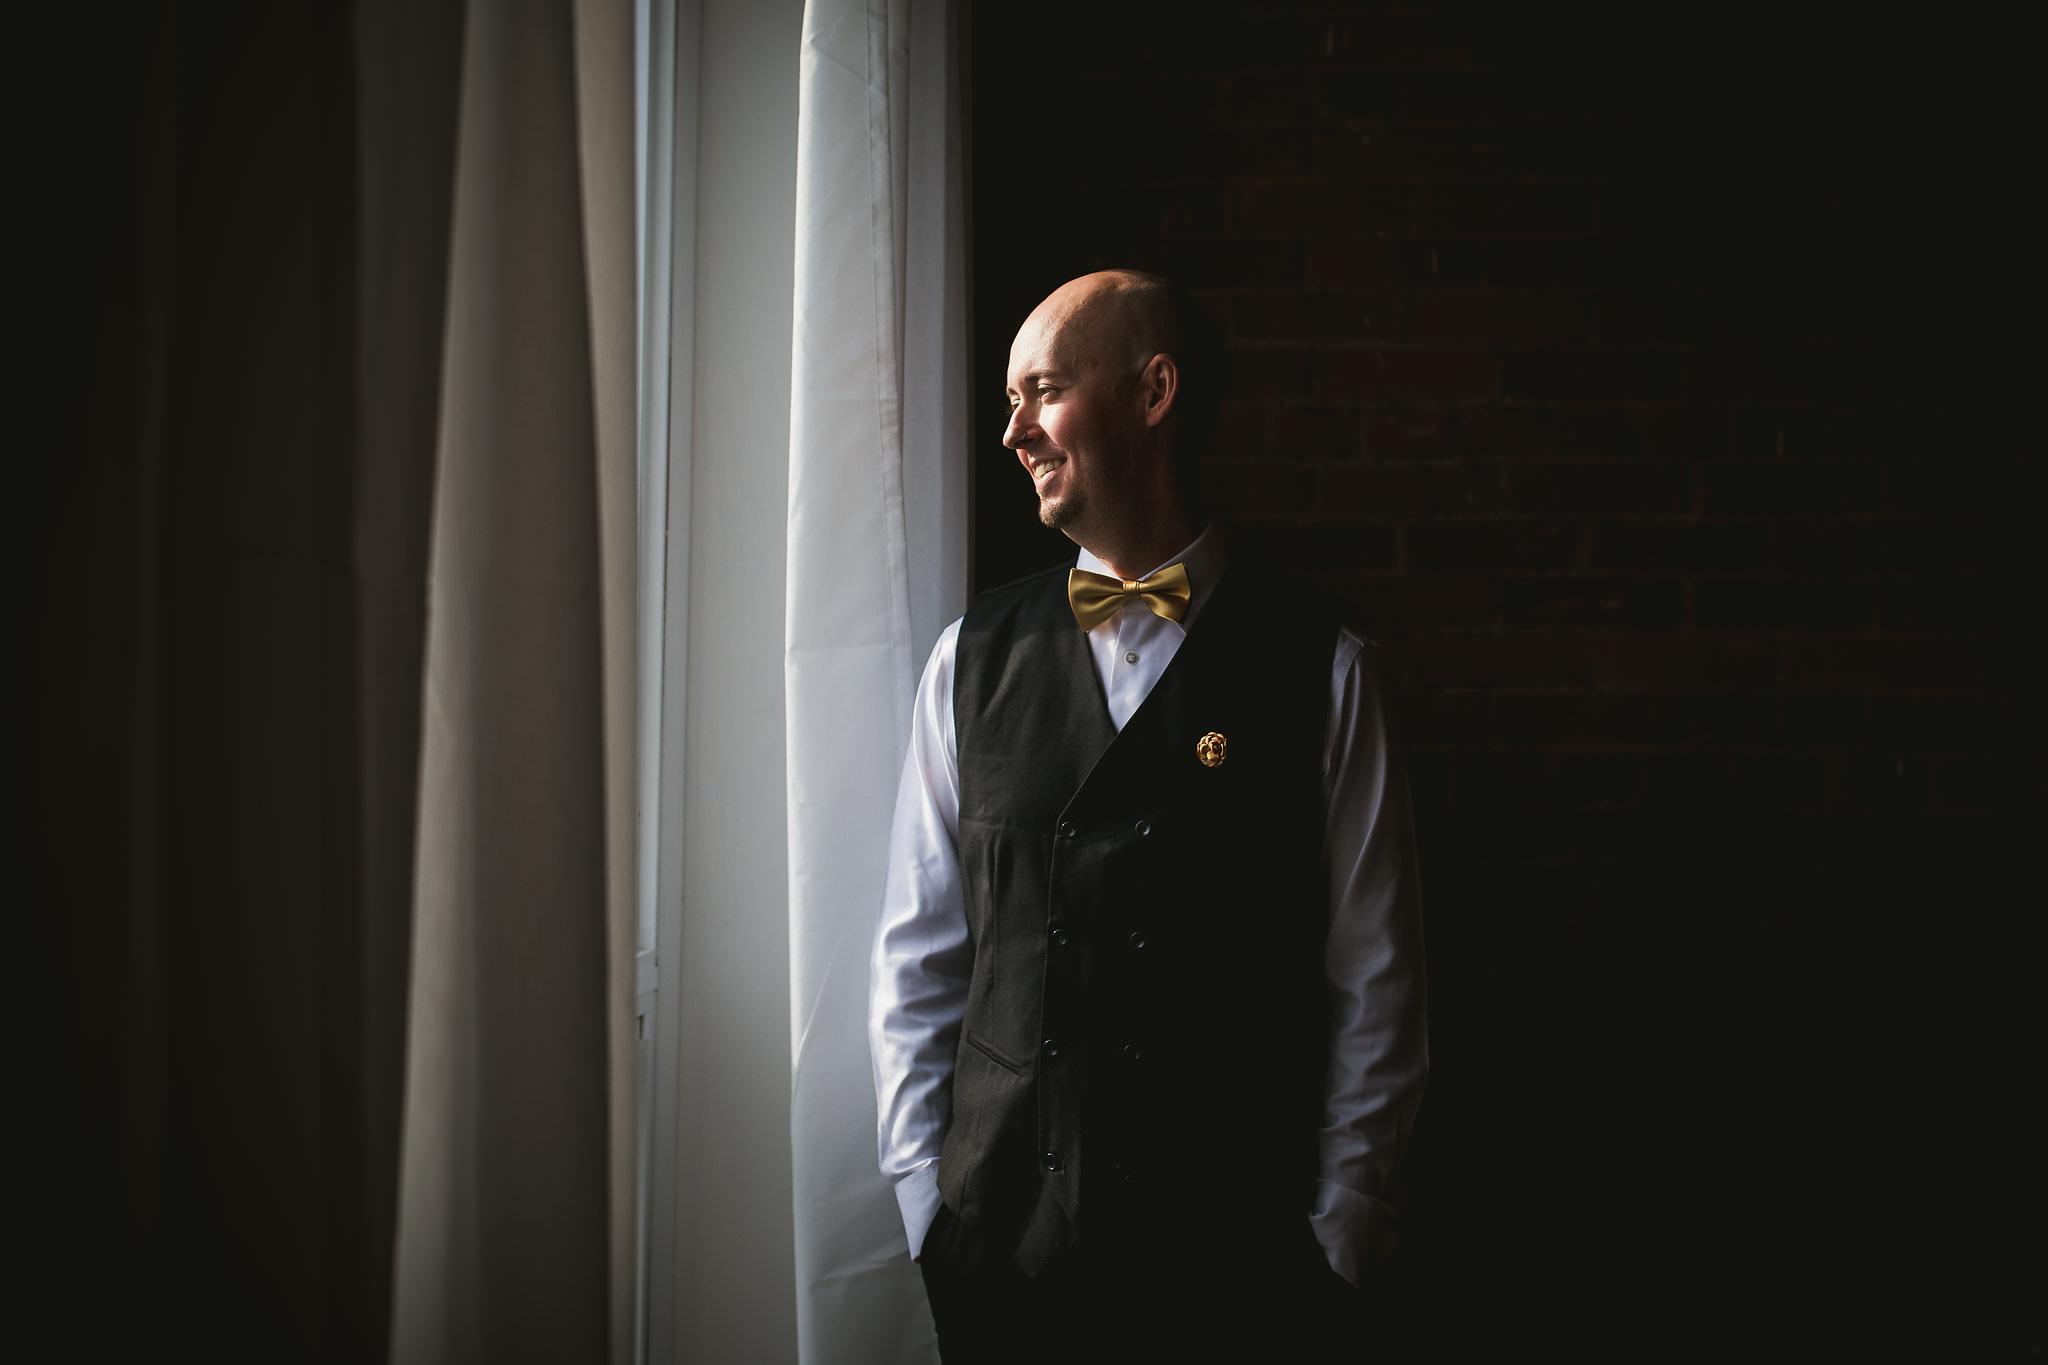 Kristen Adam Kindred Loft Whitby Wedding Photos 341 - Durham Wedding Photographer: Kindred Loft Wedding Photos